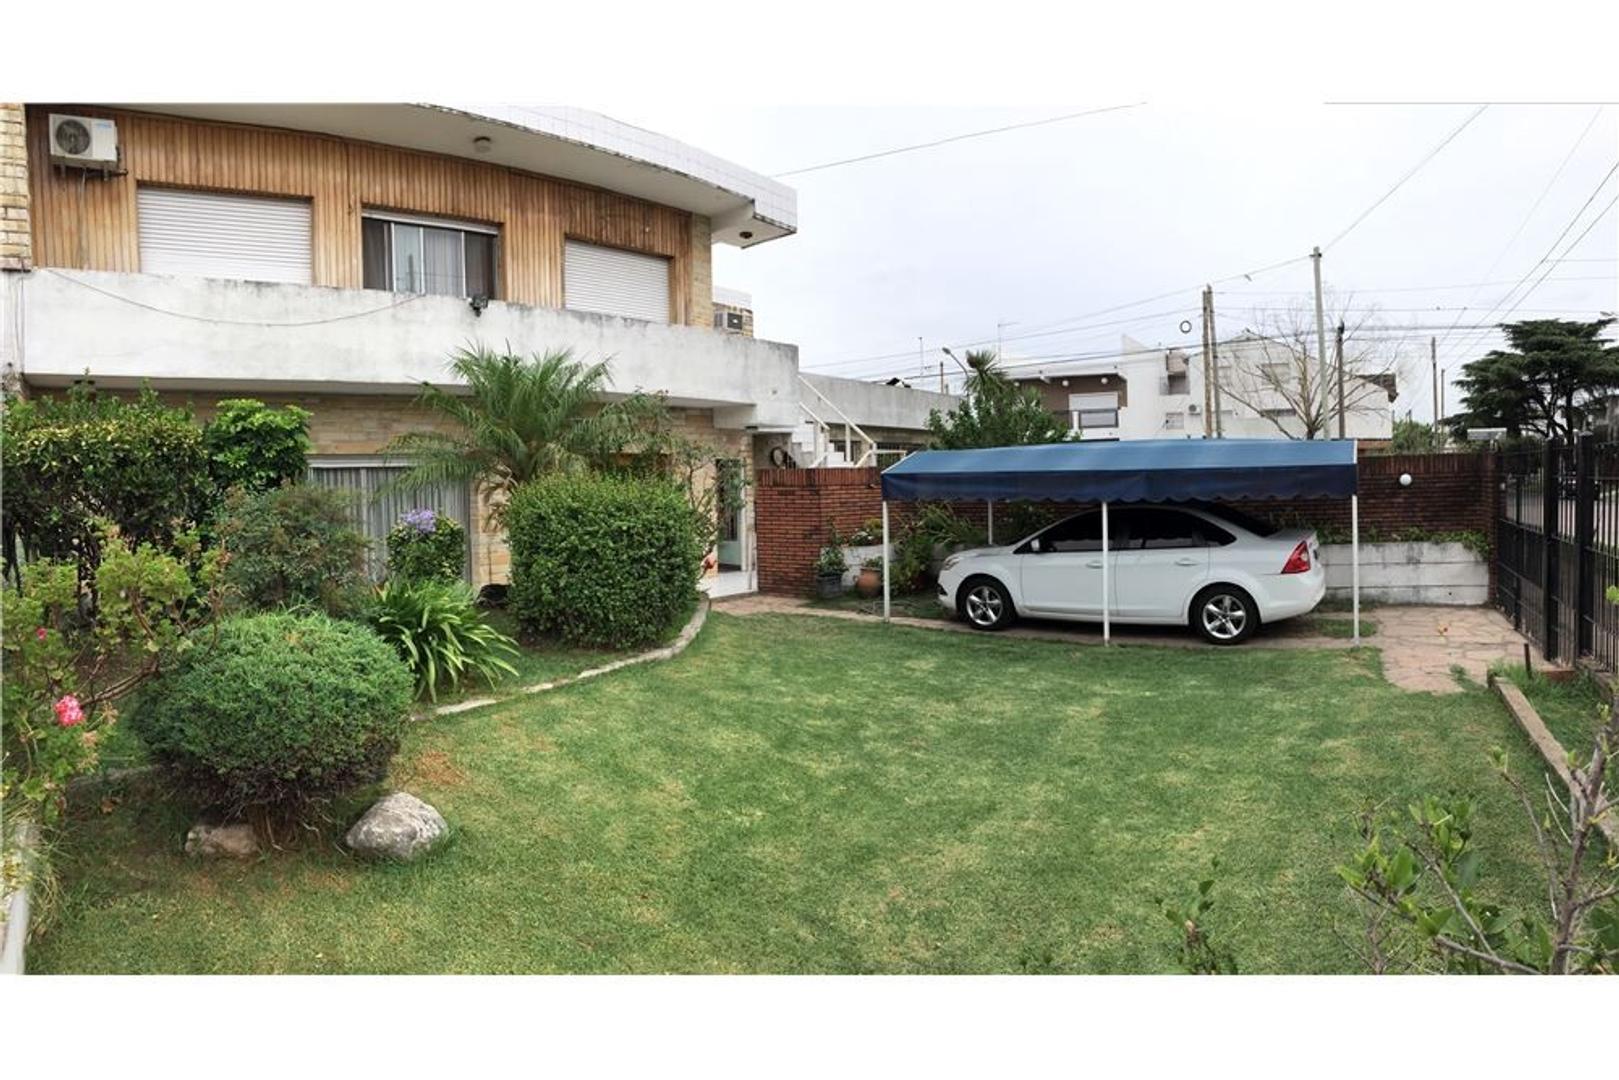 Casa 6 amb, parque, piscina, 3 garajes Moron Sur